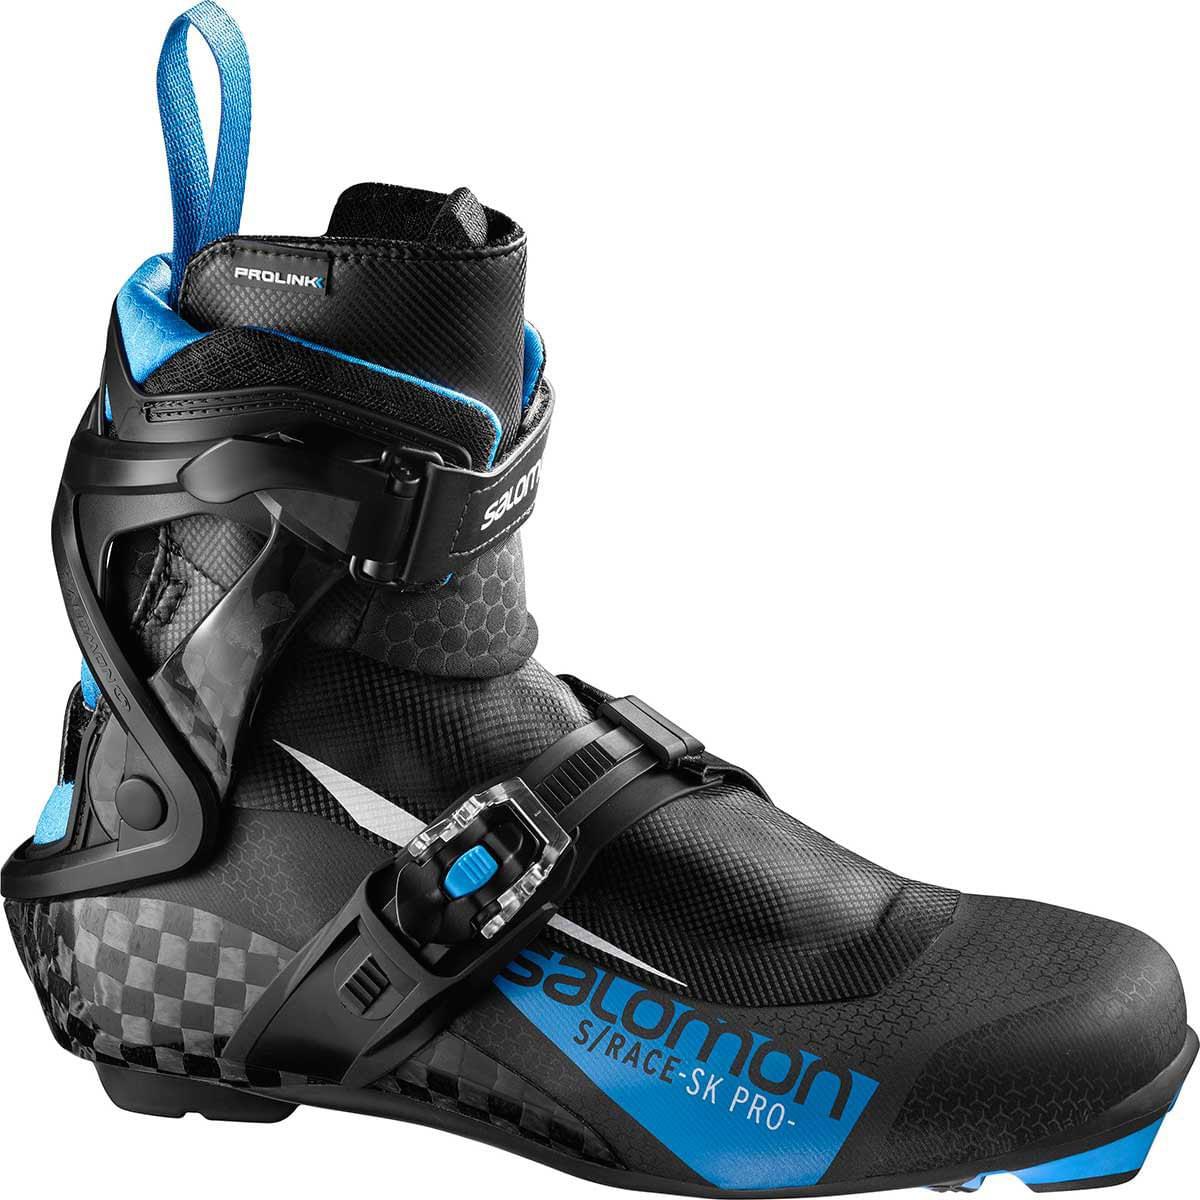 Salomon S/RACE SKATE PRO Langlaufschuh